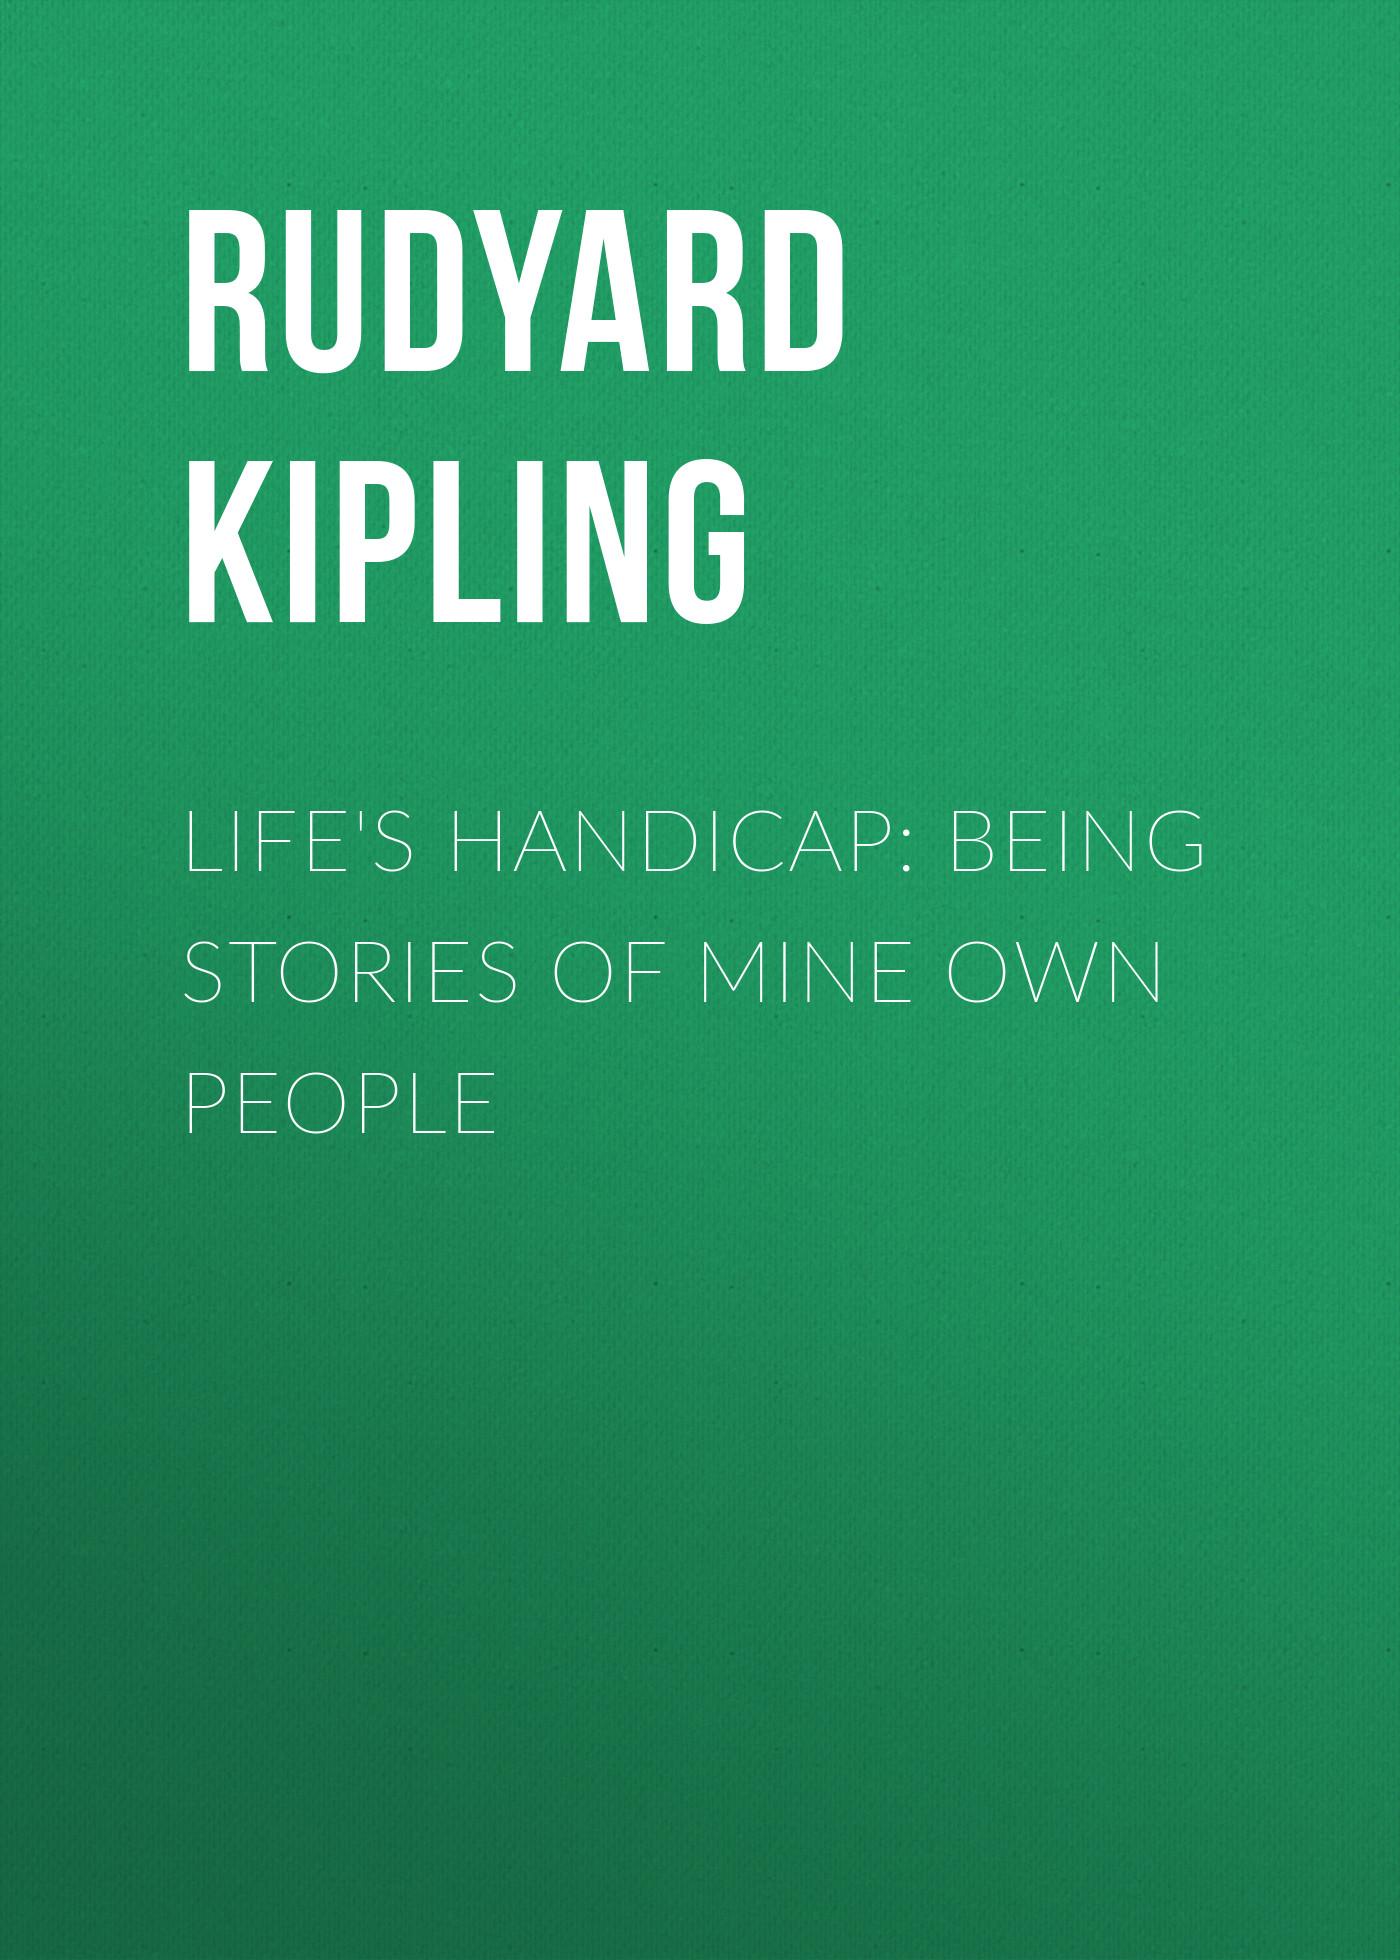 Редьярд Киплинг Life's Handicap: Being Stories of Mine Own People редьярд киплинг soldier stories